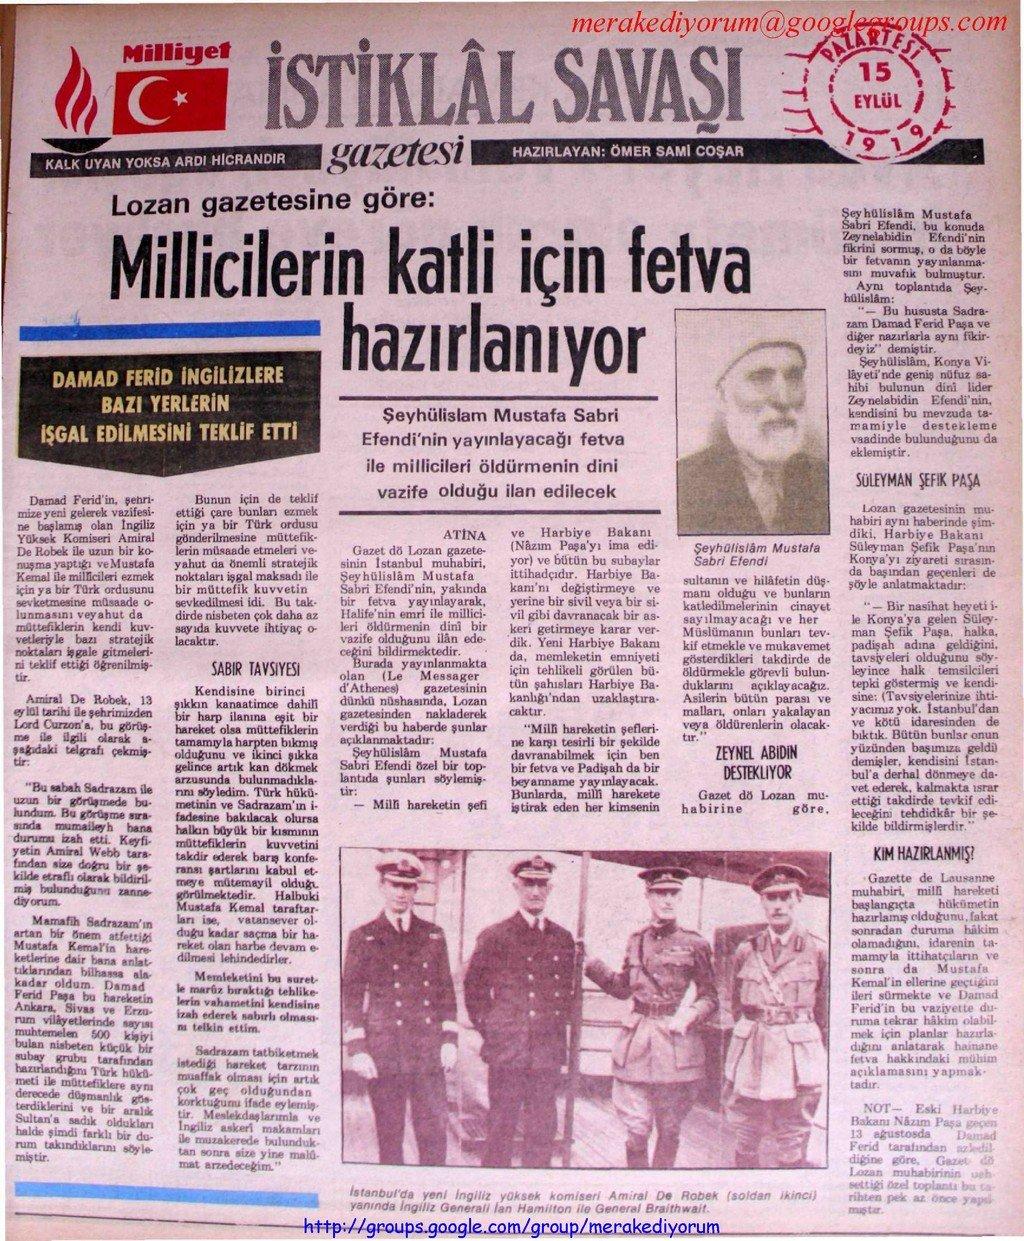 istiklal savaşı gazetesi - 15 eylül 1919